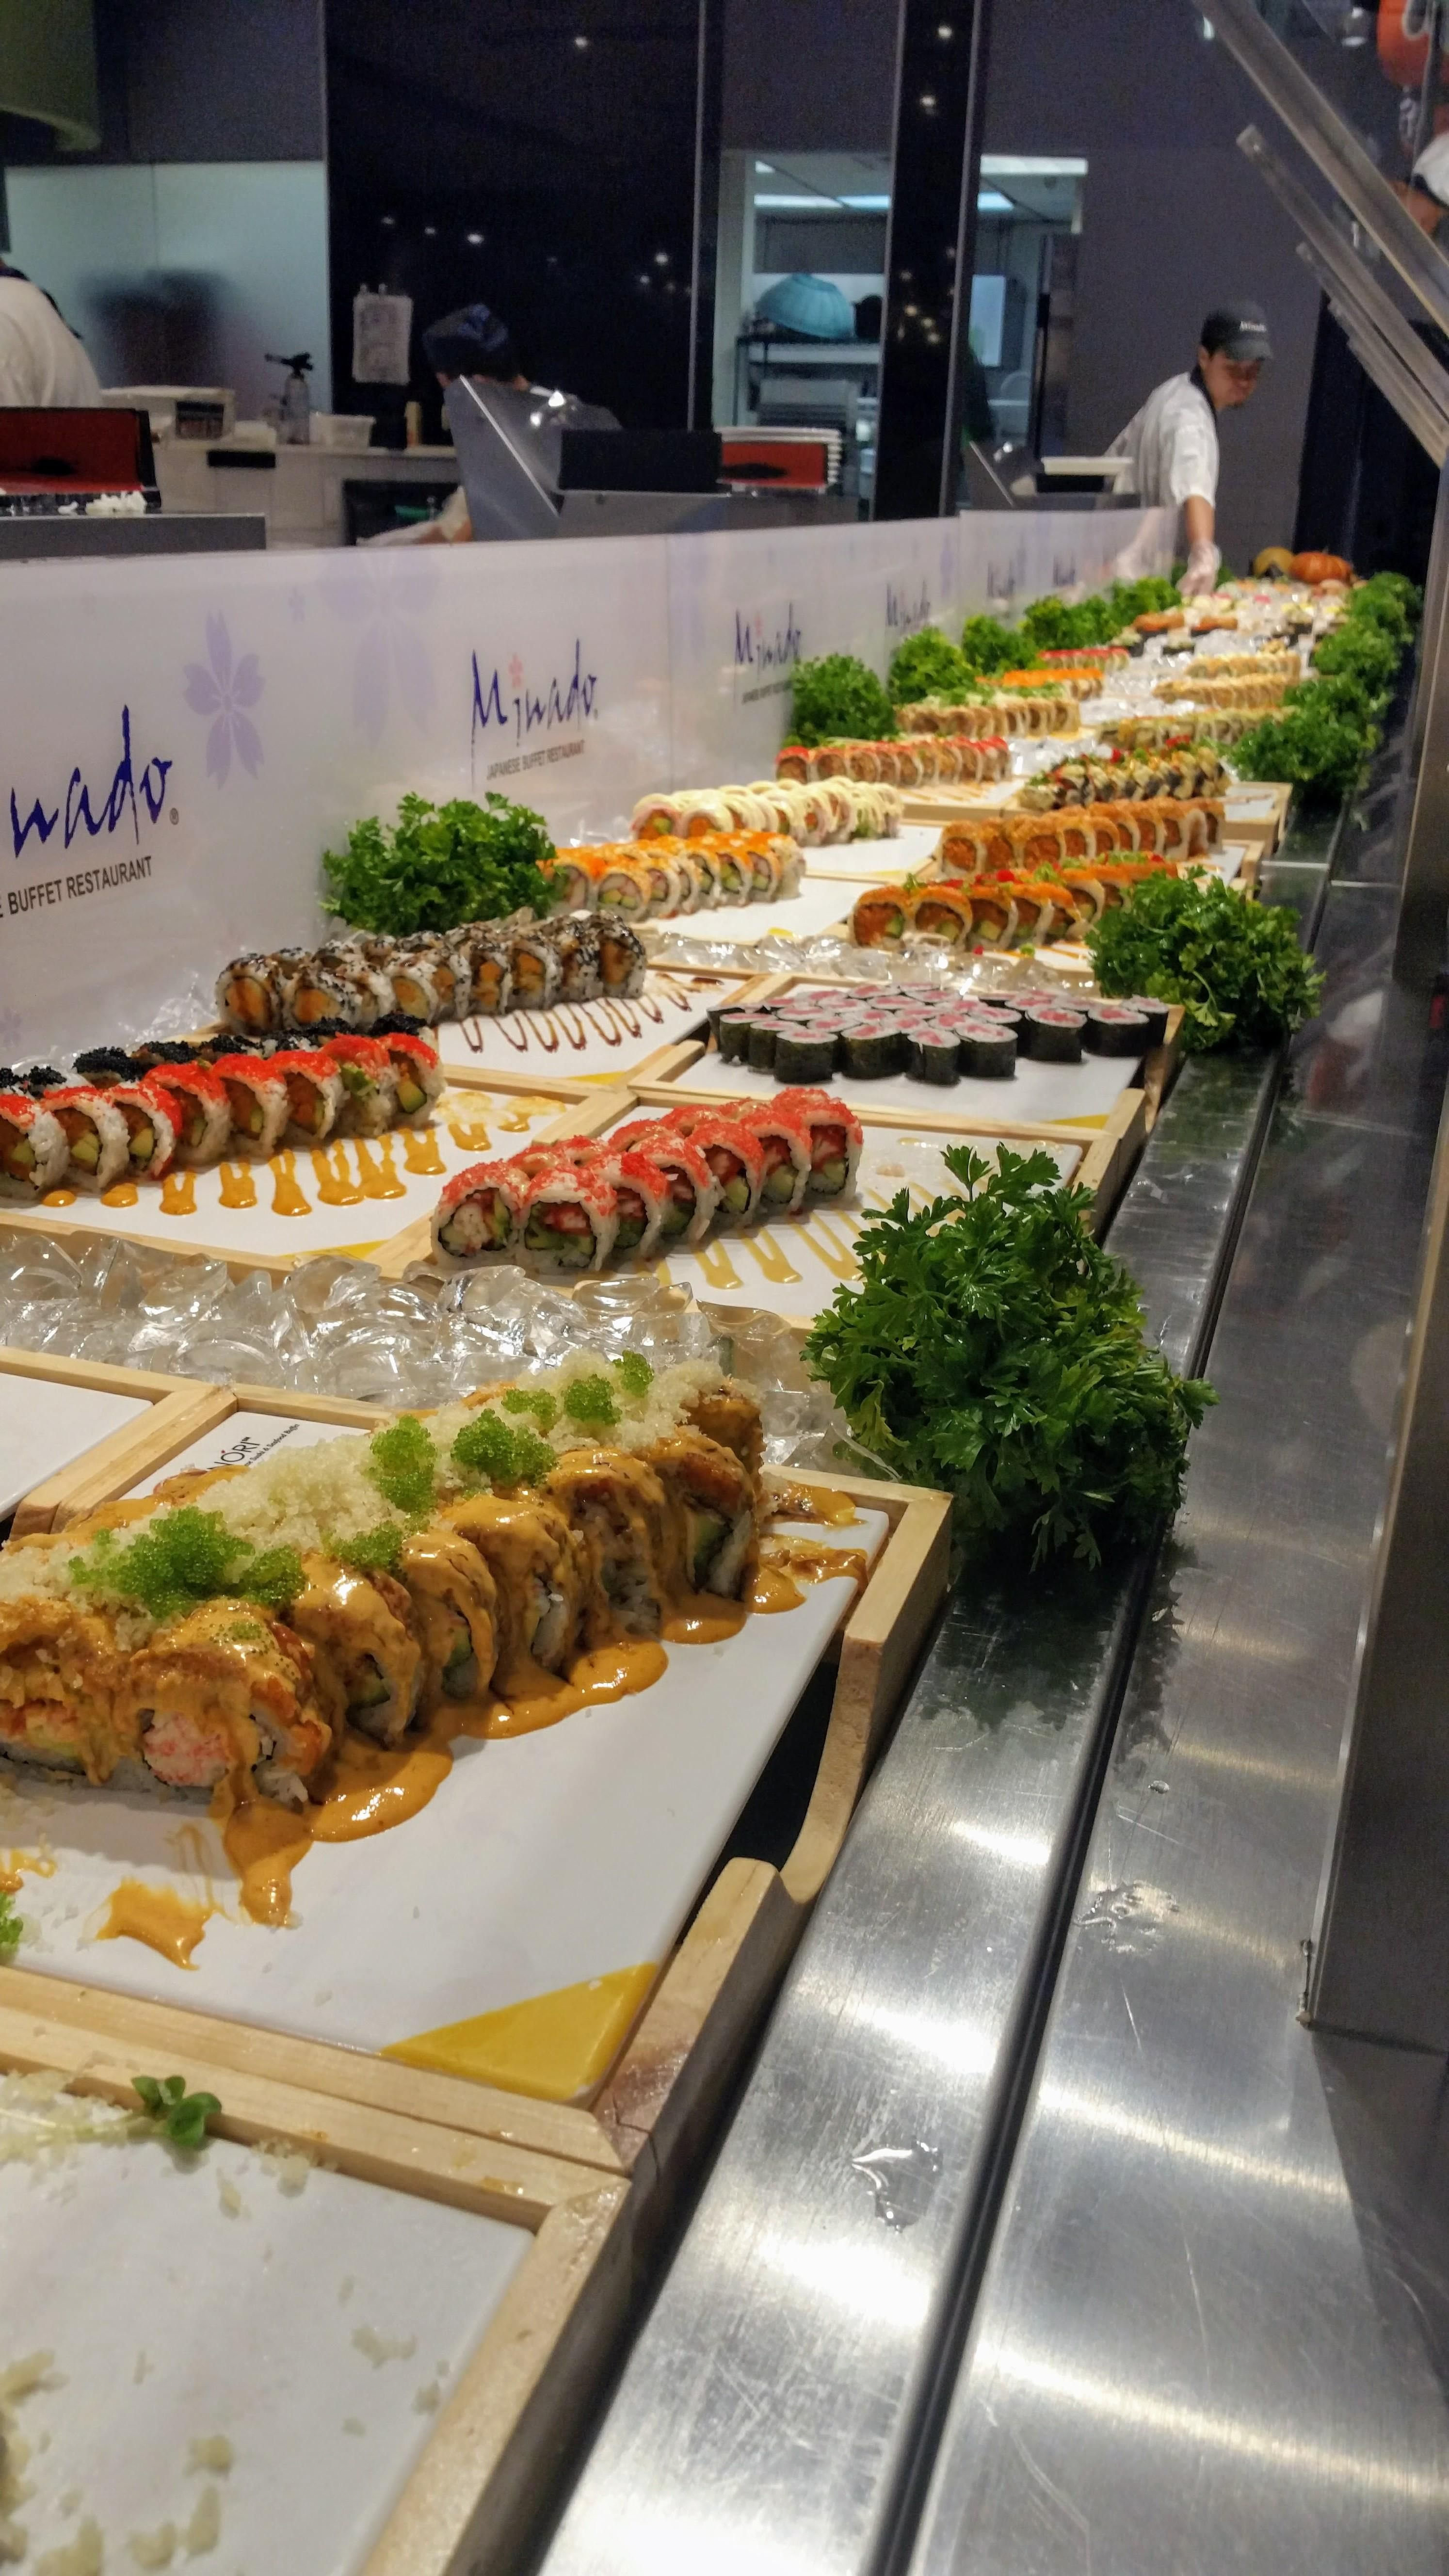 Tried A Buffet Style Ayce Recently Sushi Food Foodporn Japanese Japan Dinner Sashimi Yummy Foodie Lunch Yum Sushi Platter Sushi Buffet Buffet Food